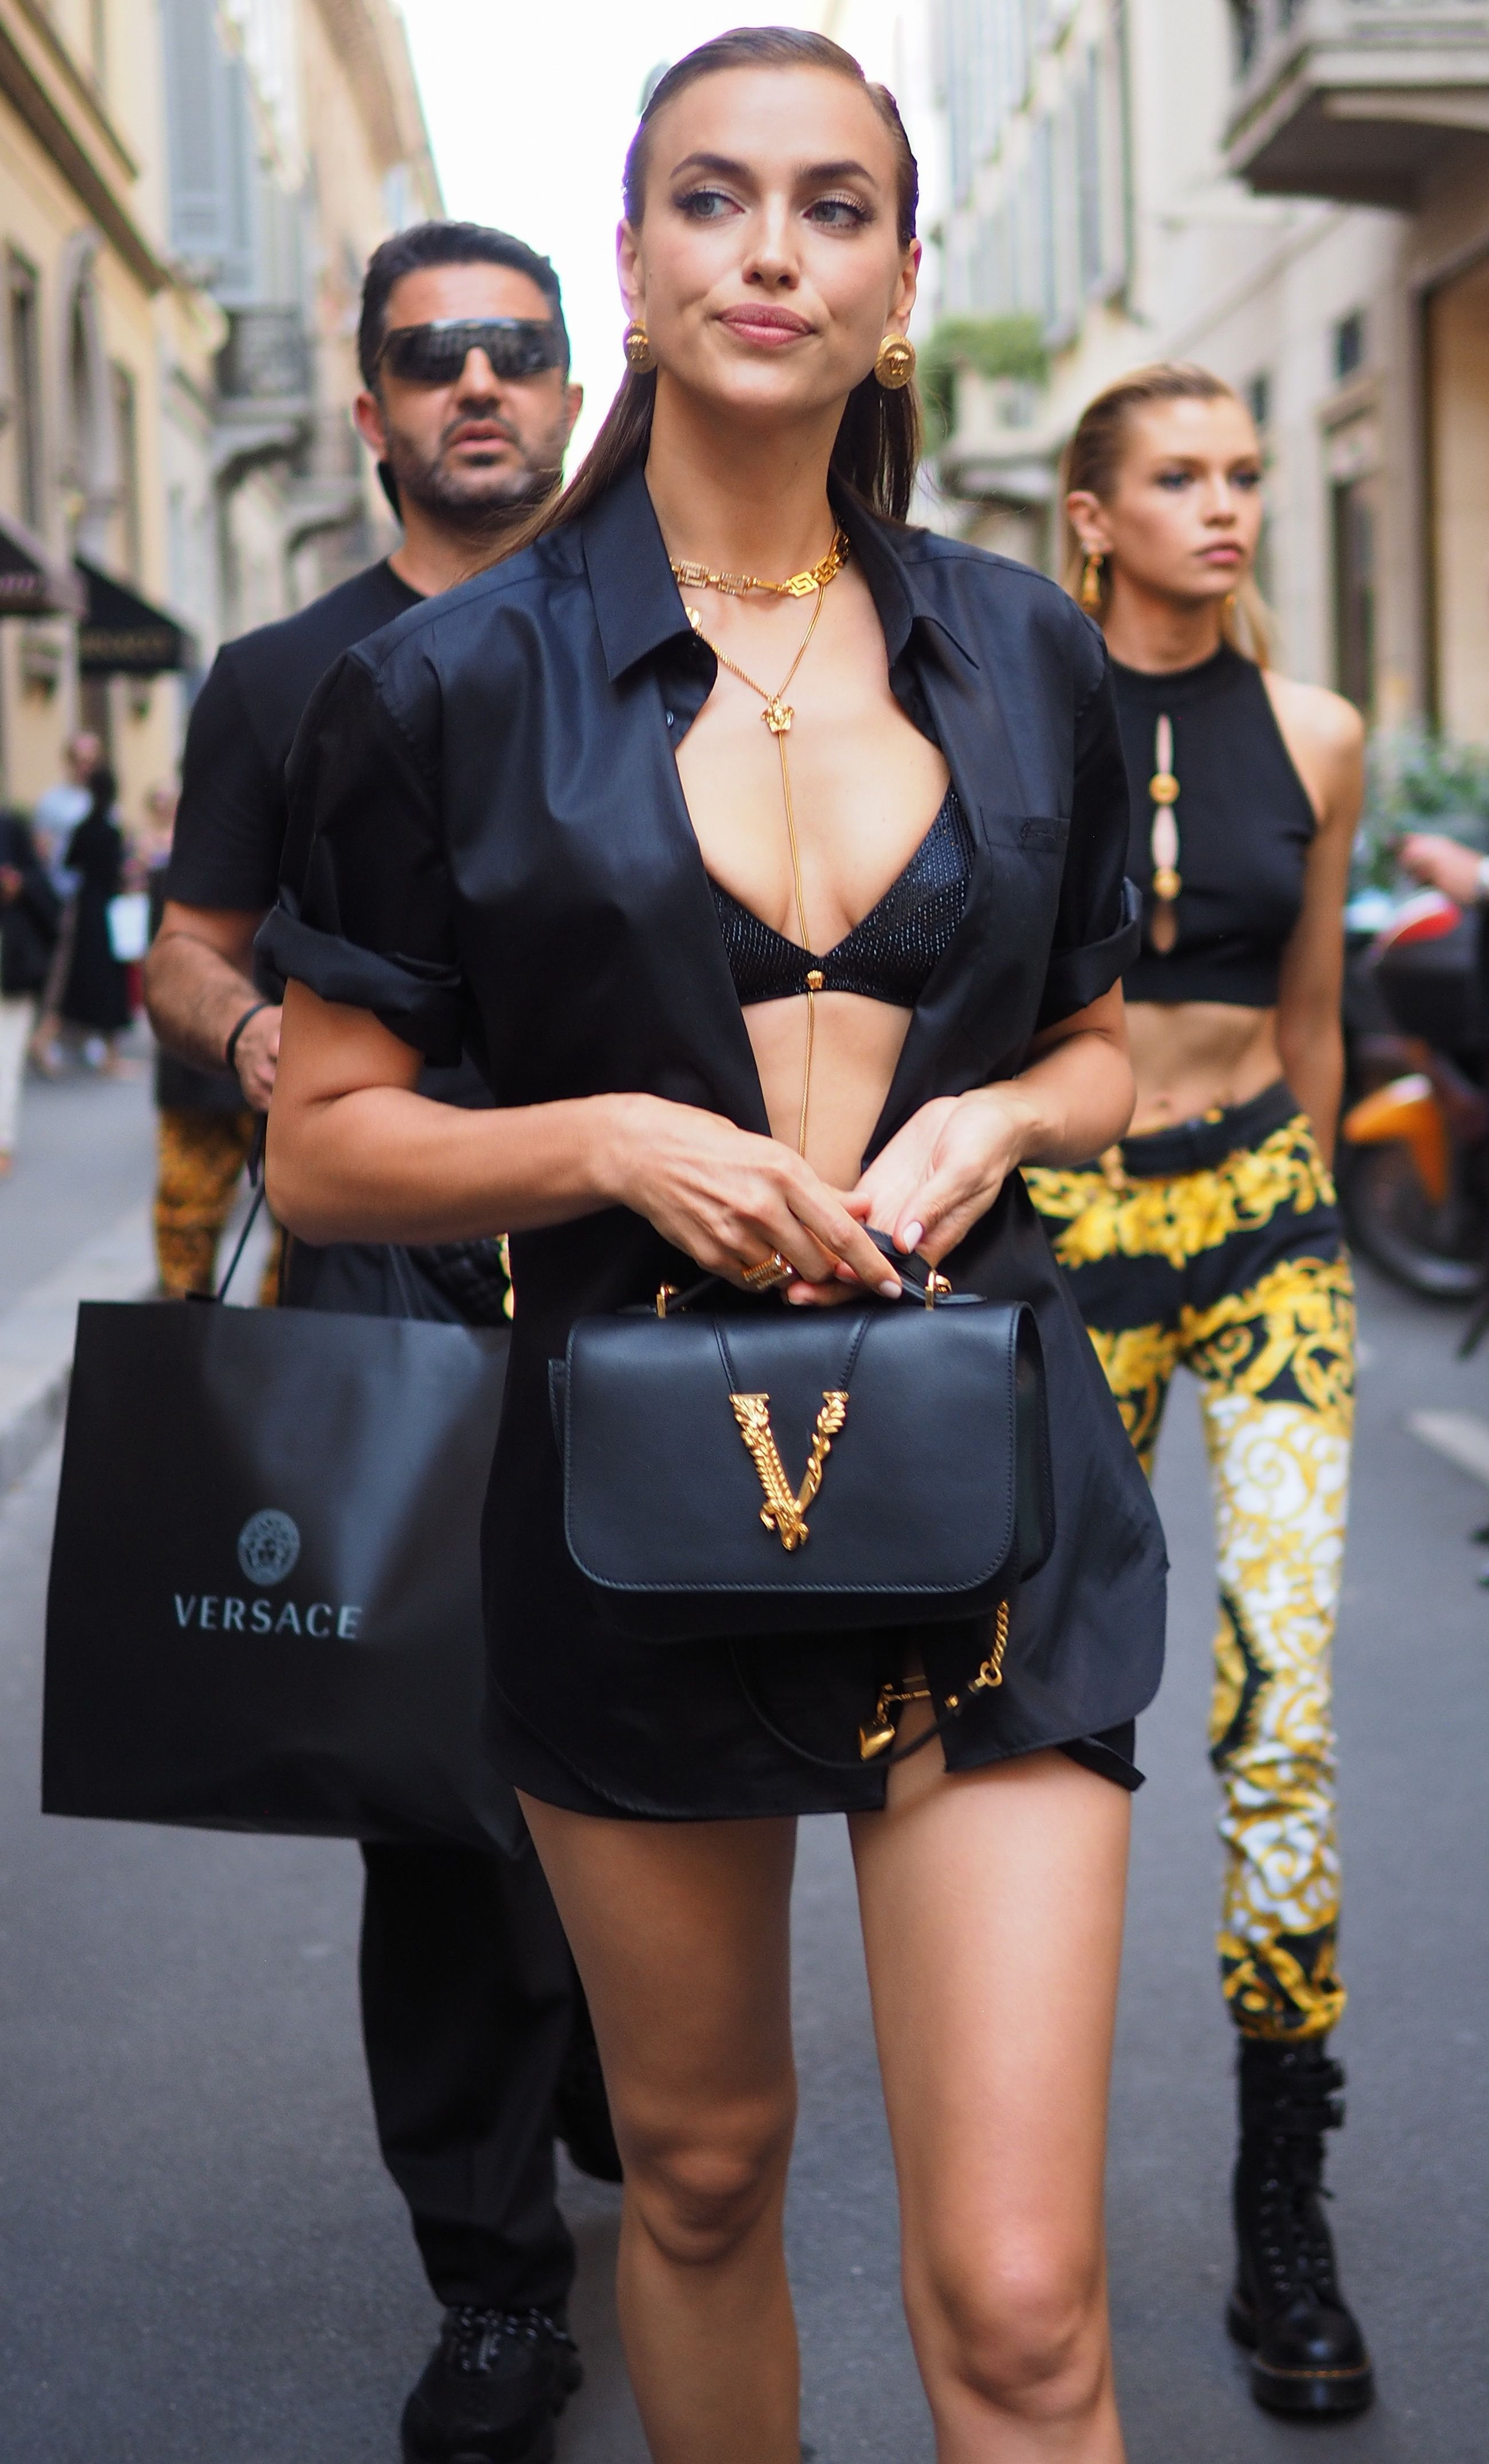 Irina Shayk in the street